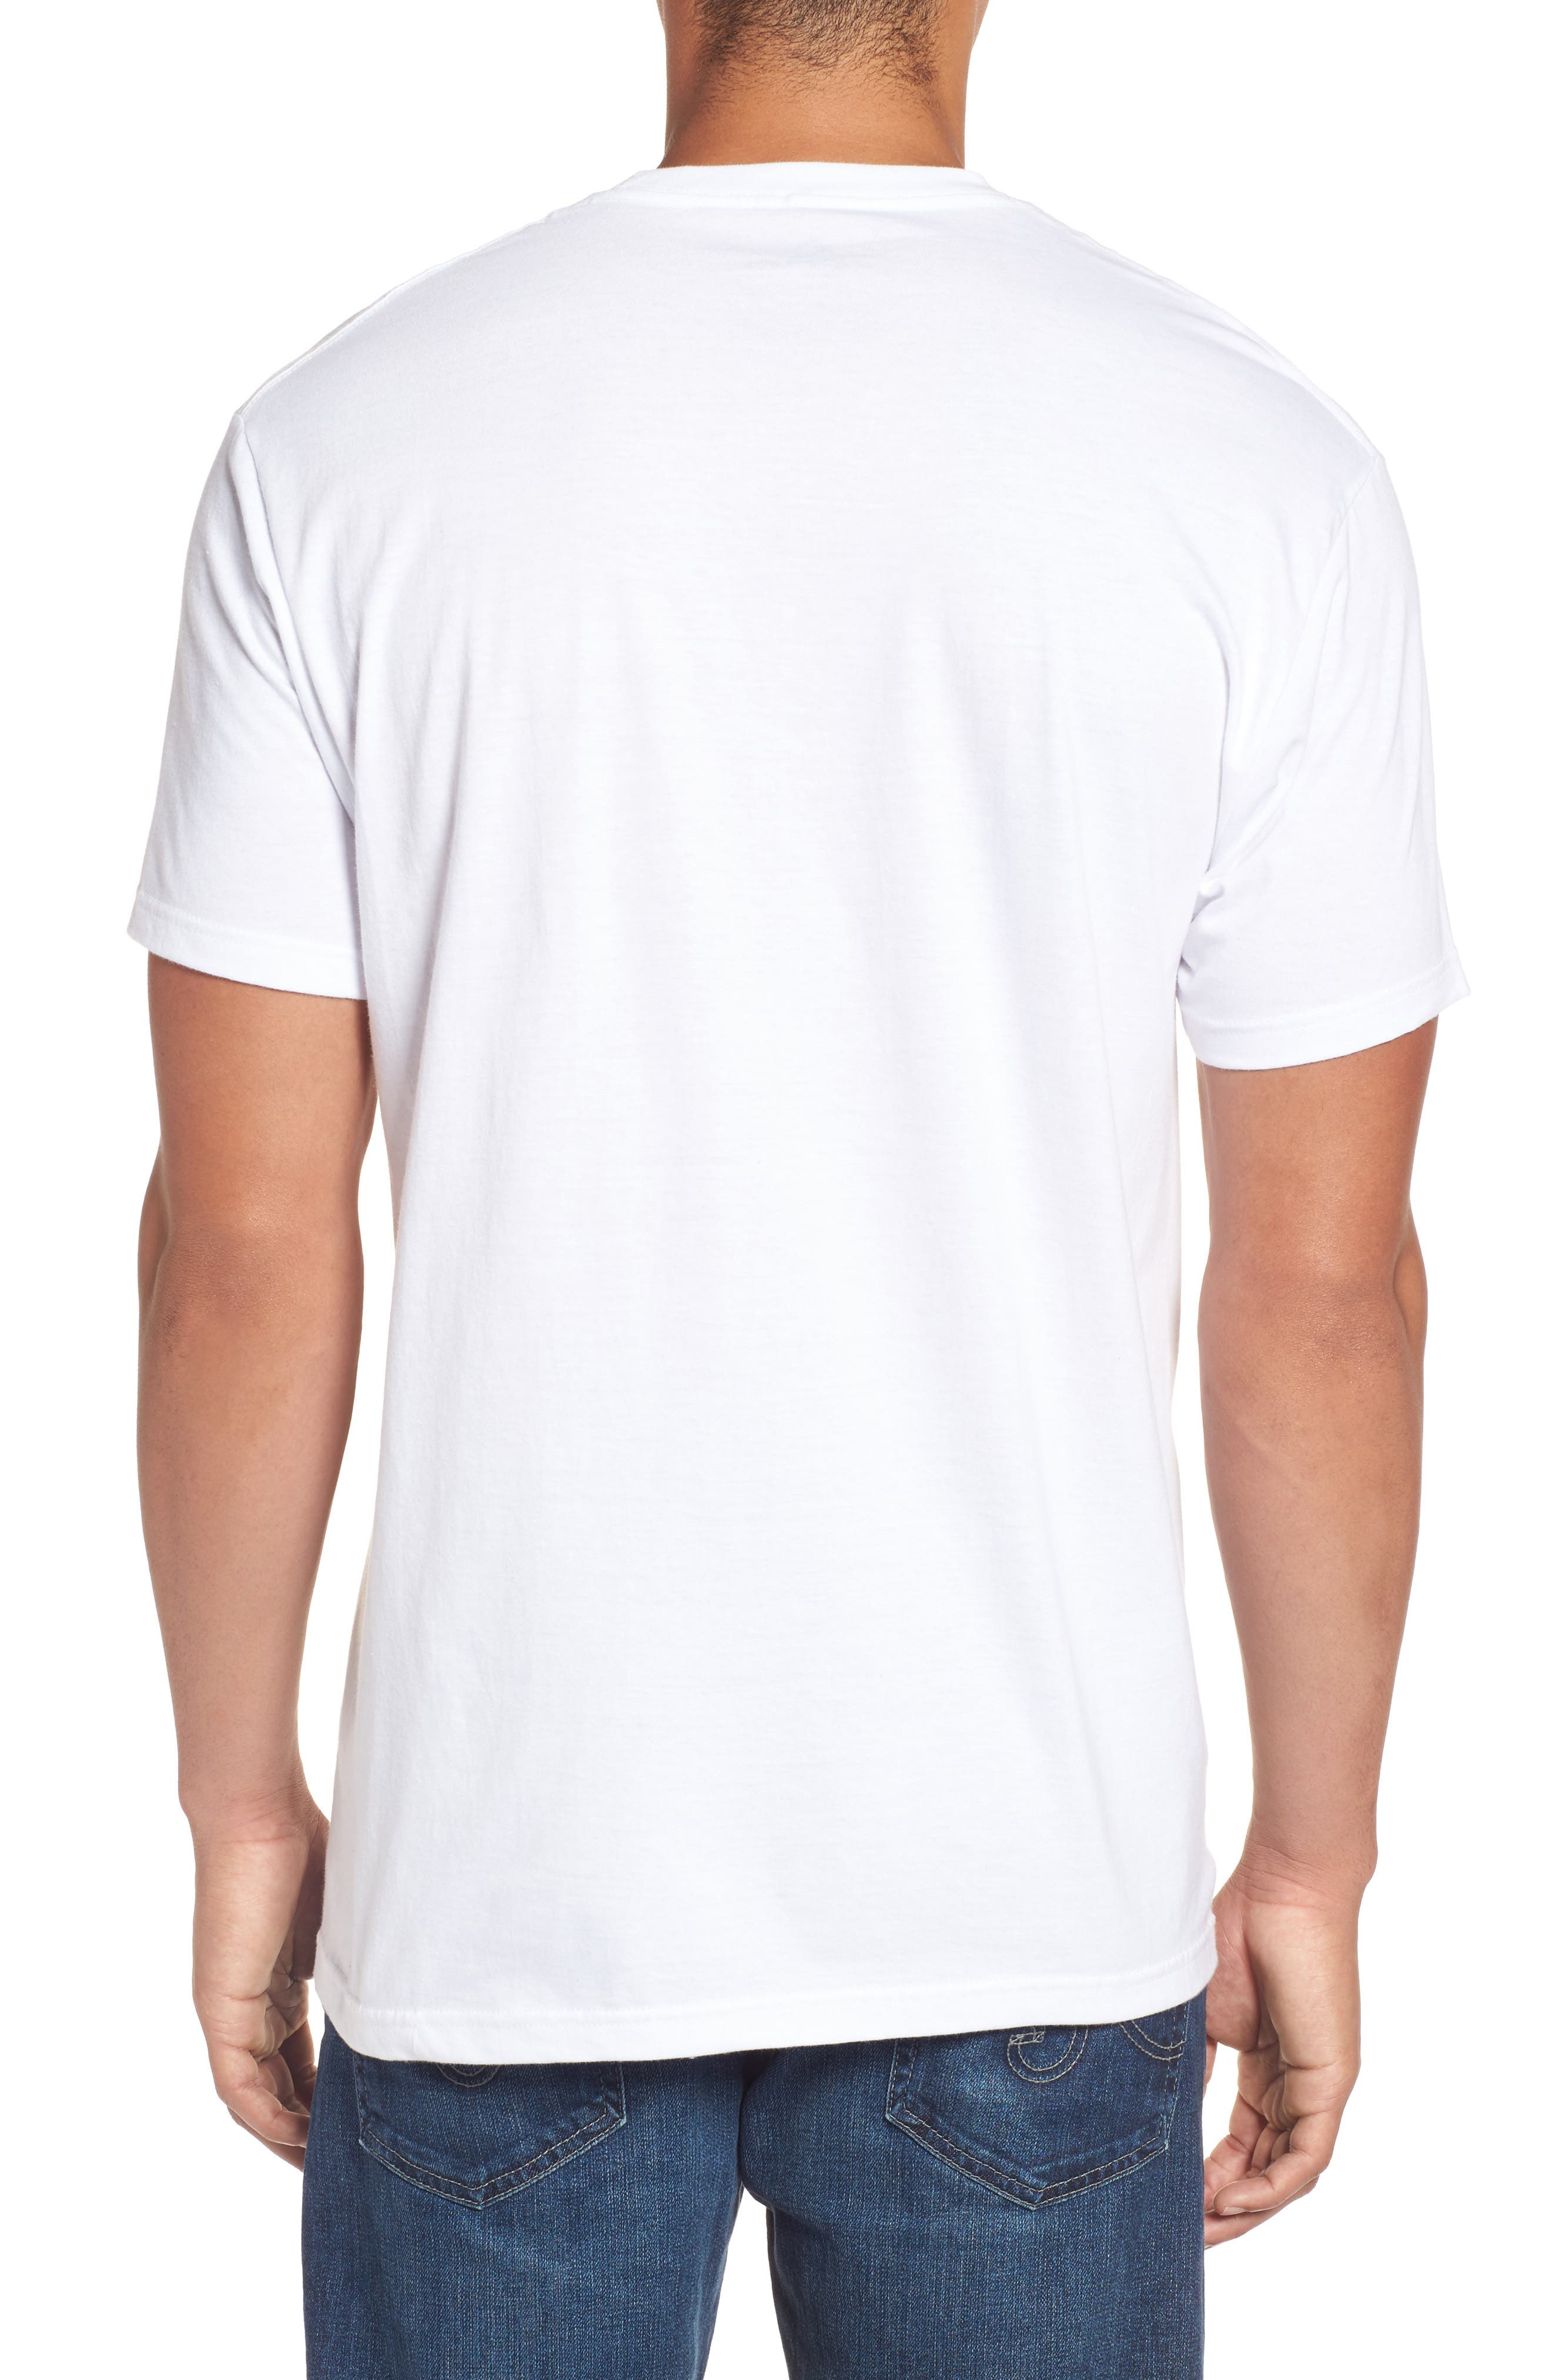 Alternate Image 2  - Rip Curl Terra Graphic T-Shirt